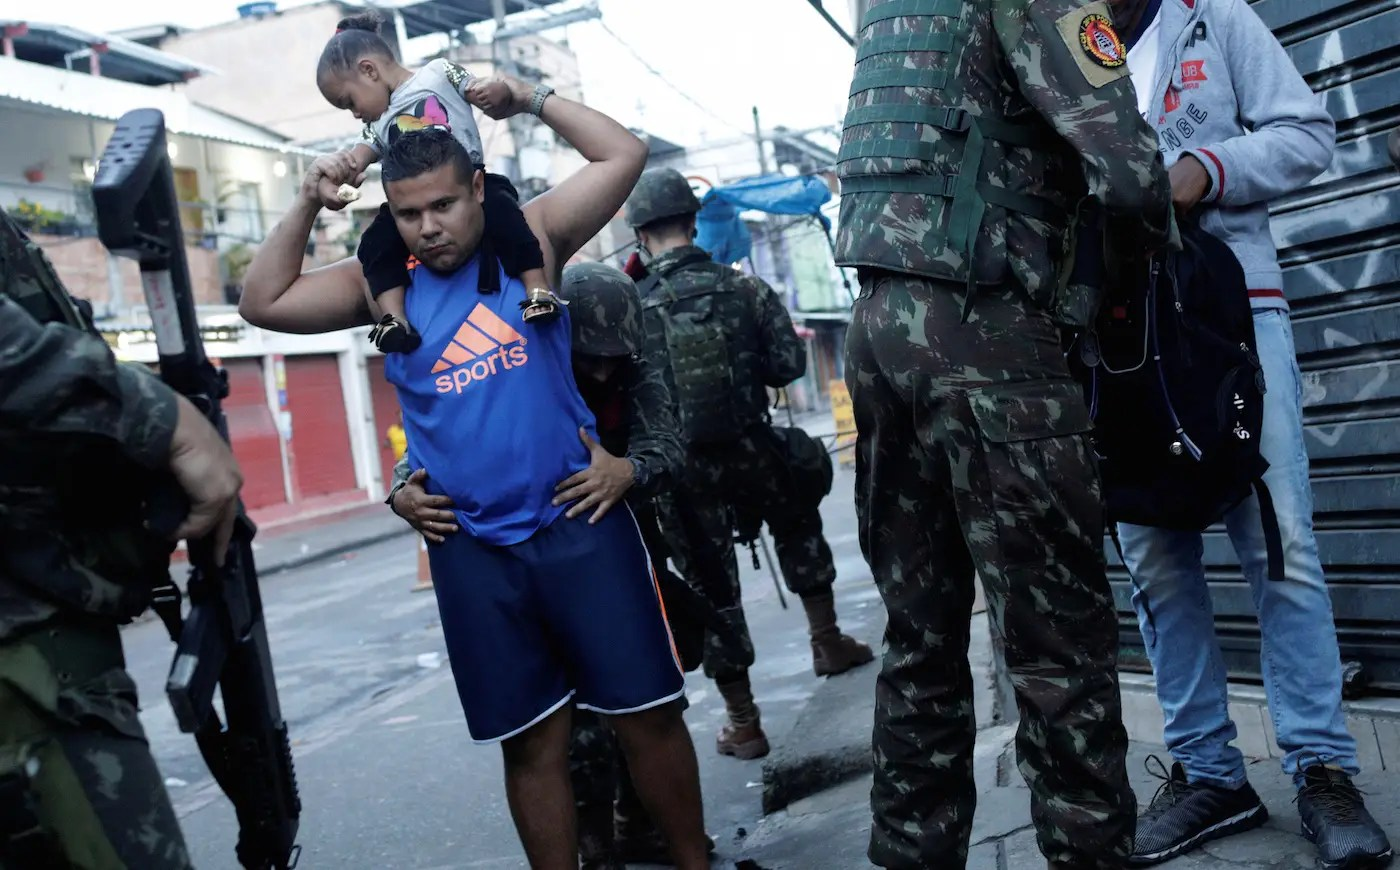 Brazil Rio de Janeiro police soldiers crime